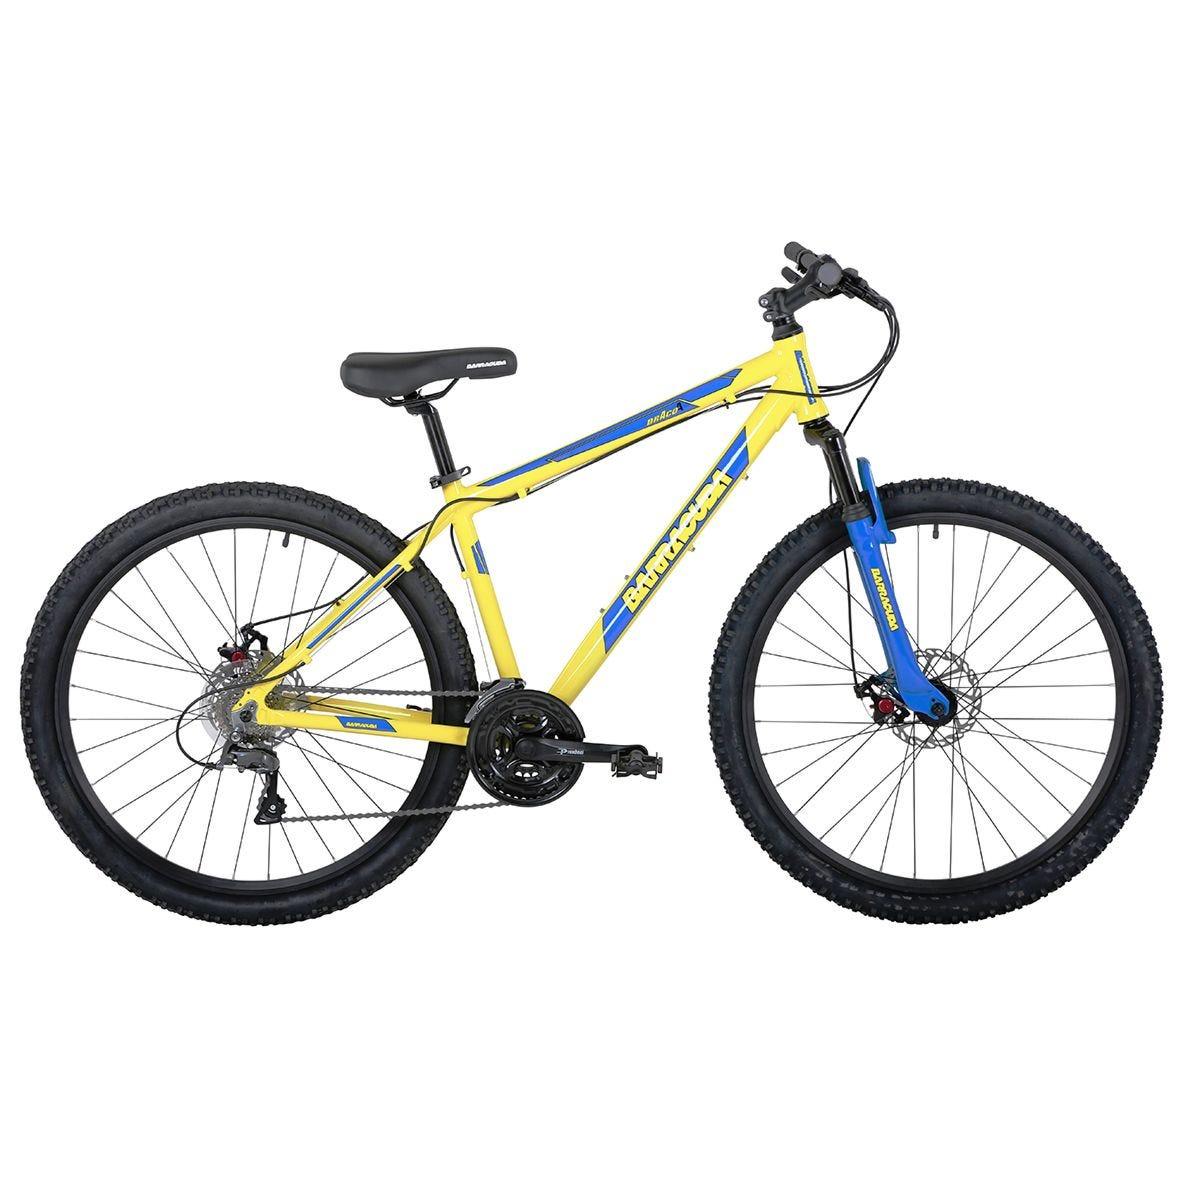 Barracuda Draco 4 Frame 27.5 Inch Wheel 24 Speed Disc Brake Mountain Bike - Yellow/Blue